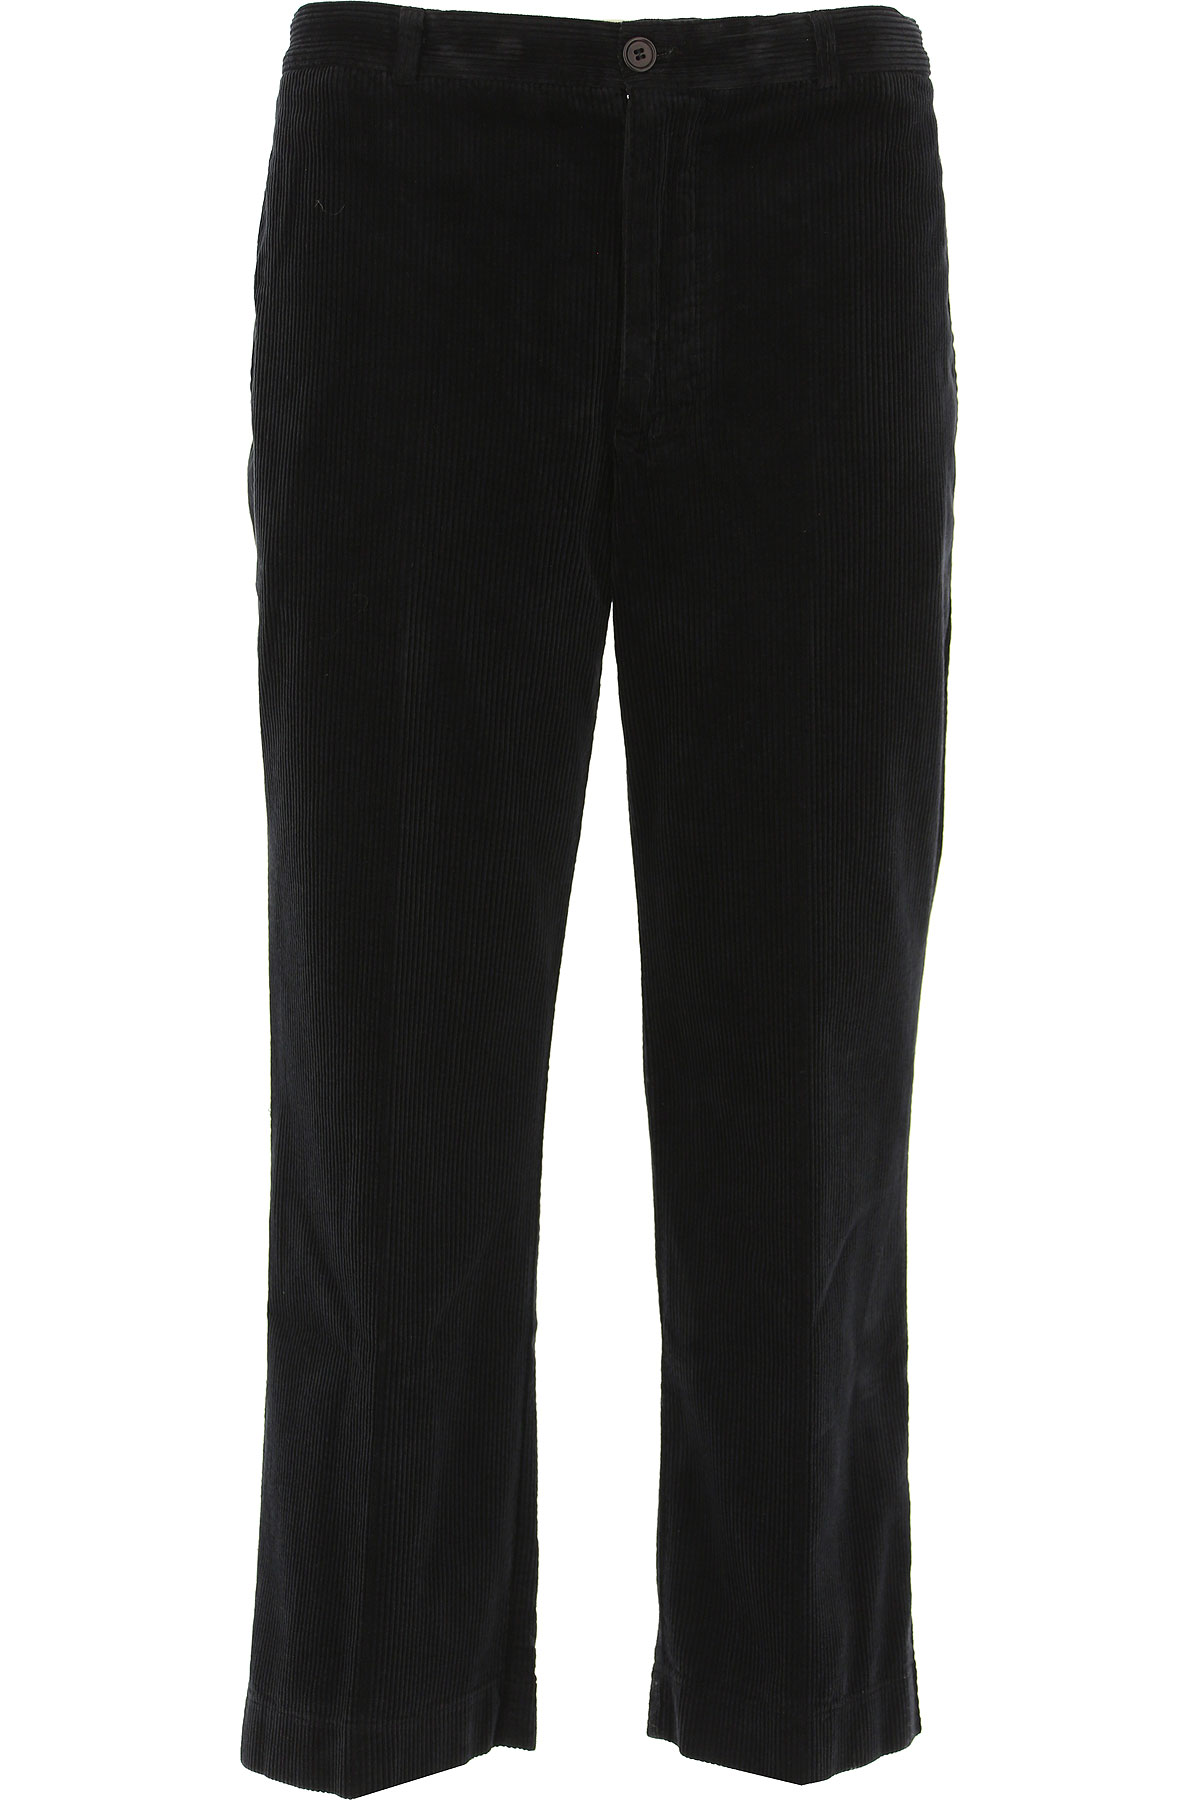 Image of Aspesi Pants for Women, navy, Cotton, 2017, 26 30